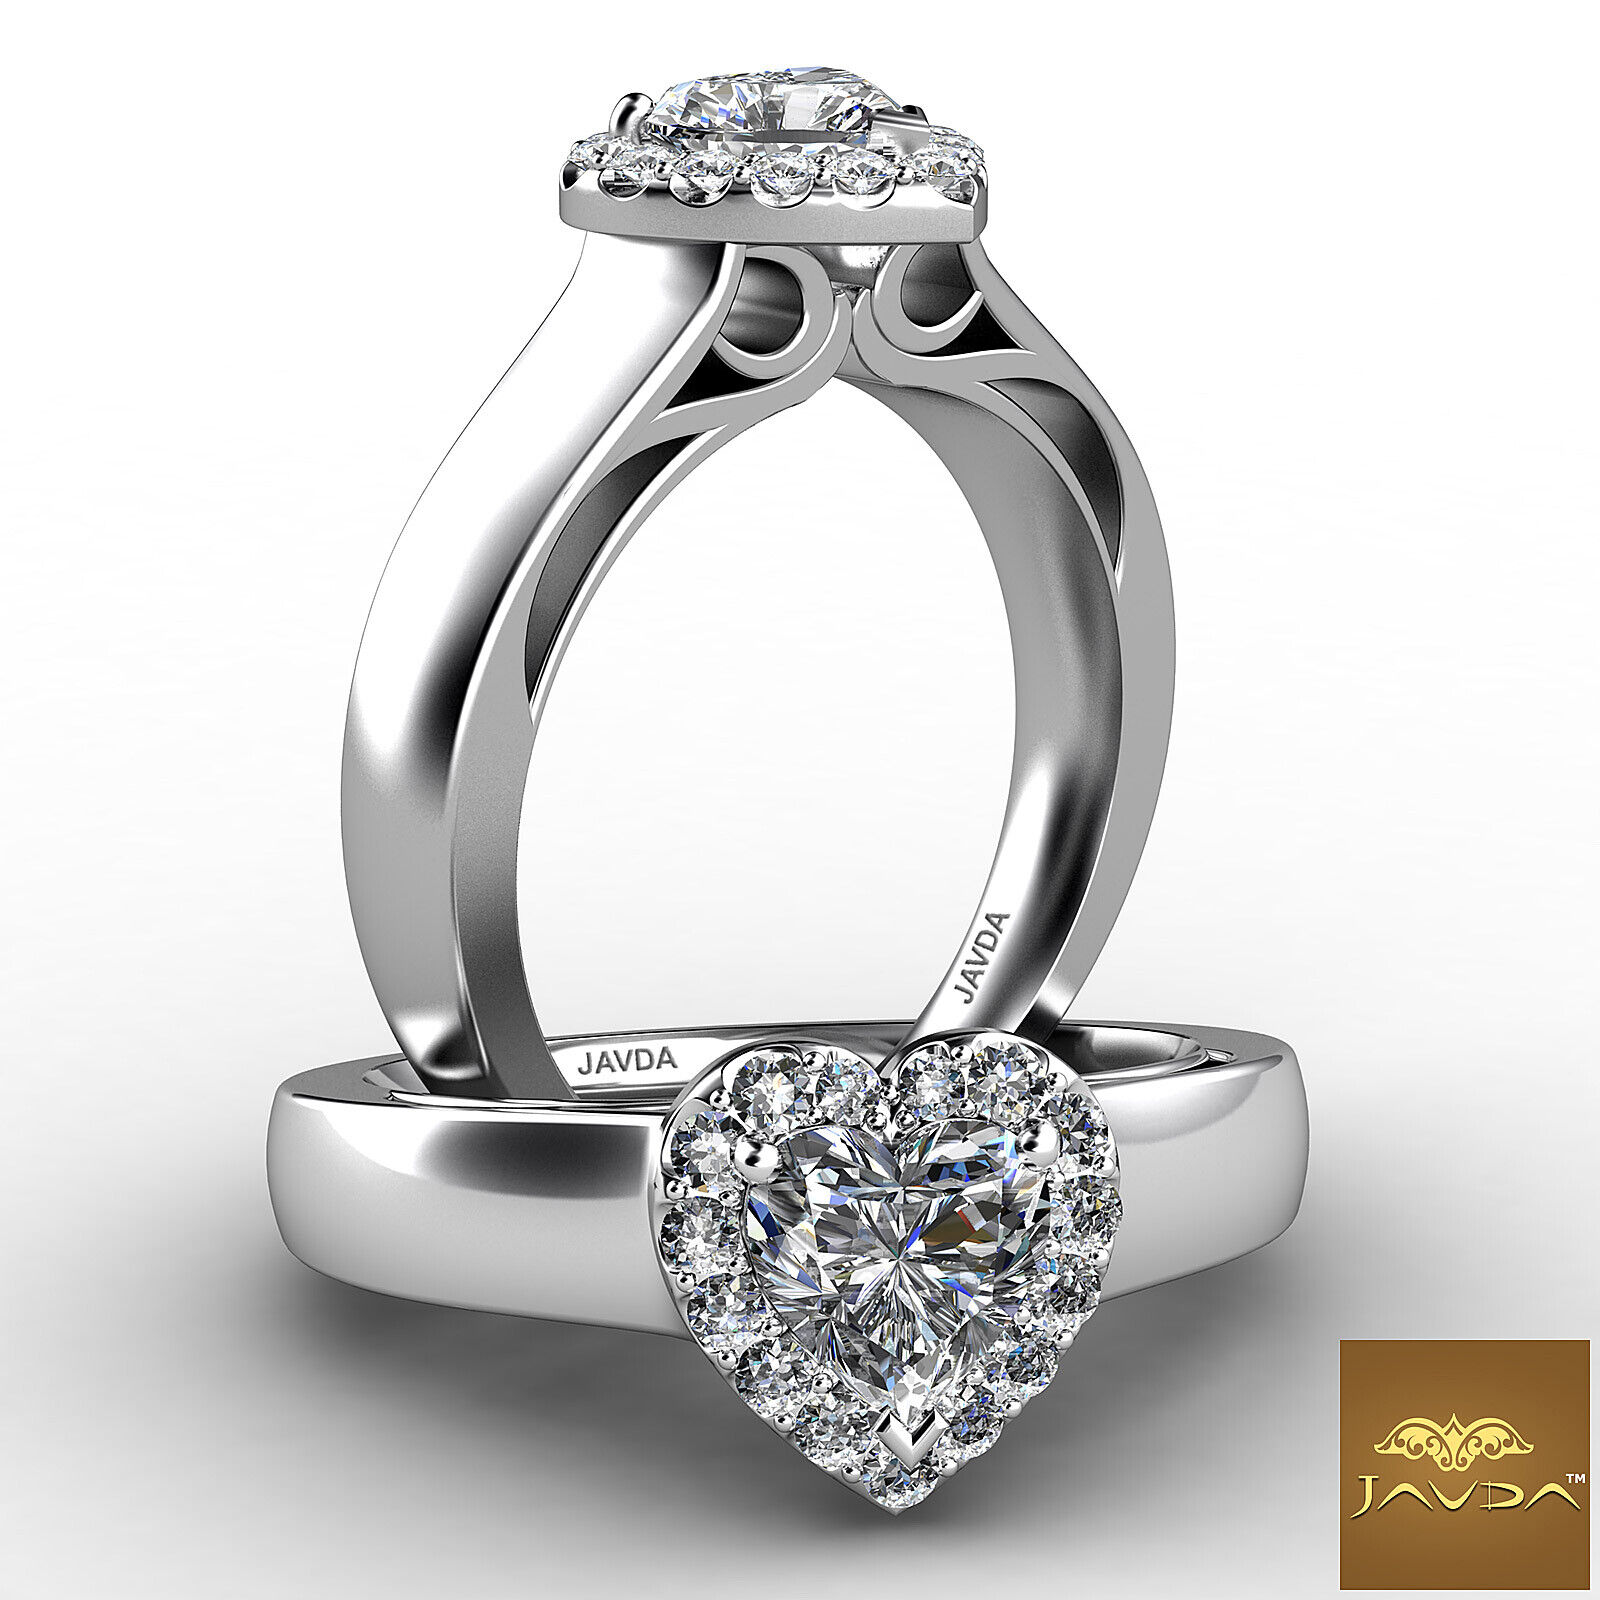 0.74ctw Halo Filigree Side-Stone Heart Diamond Engagement Ring GIA F-VS1 W Gold